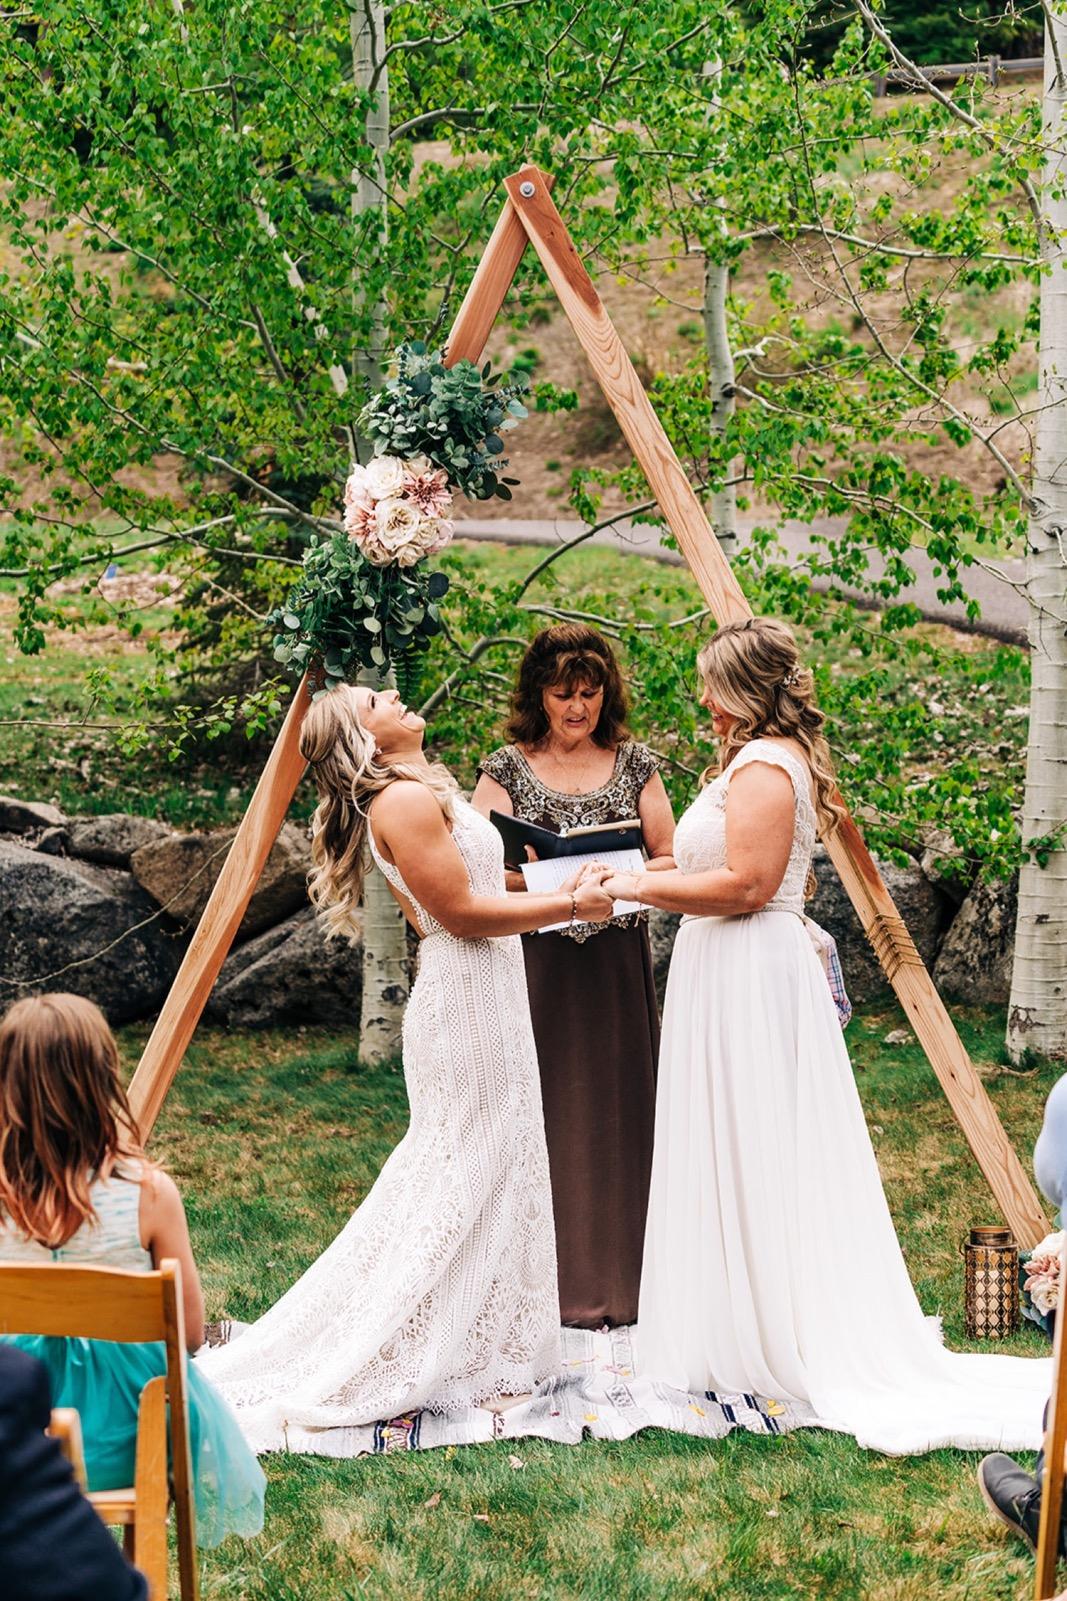 084_falissa_heather_wedding-215.jpg